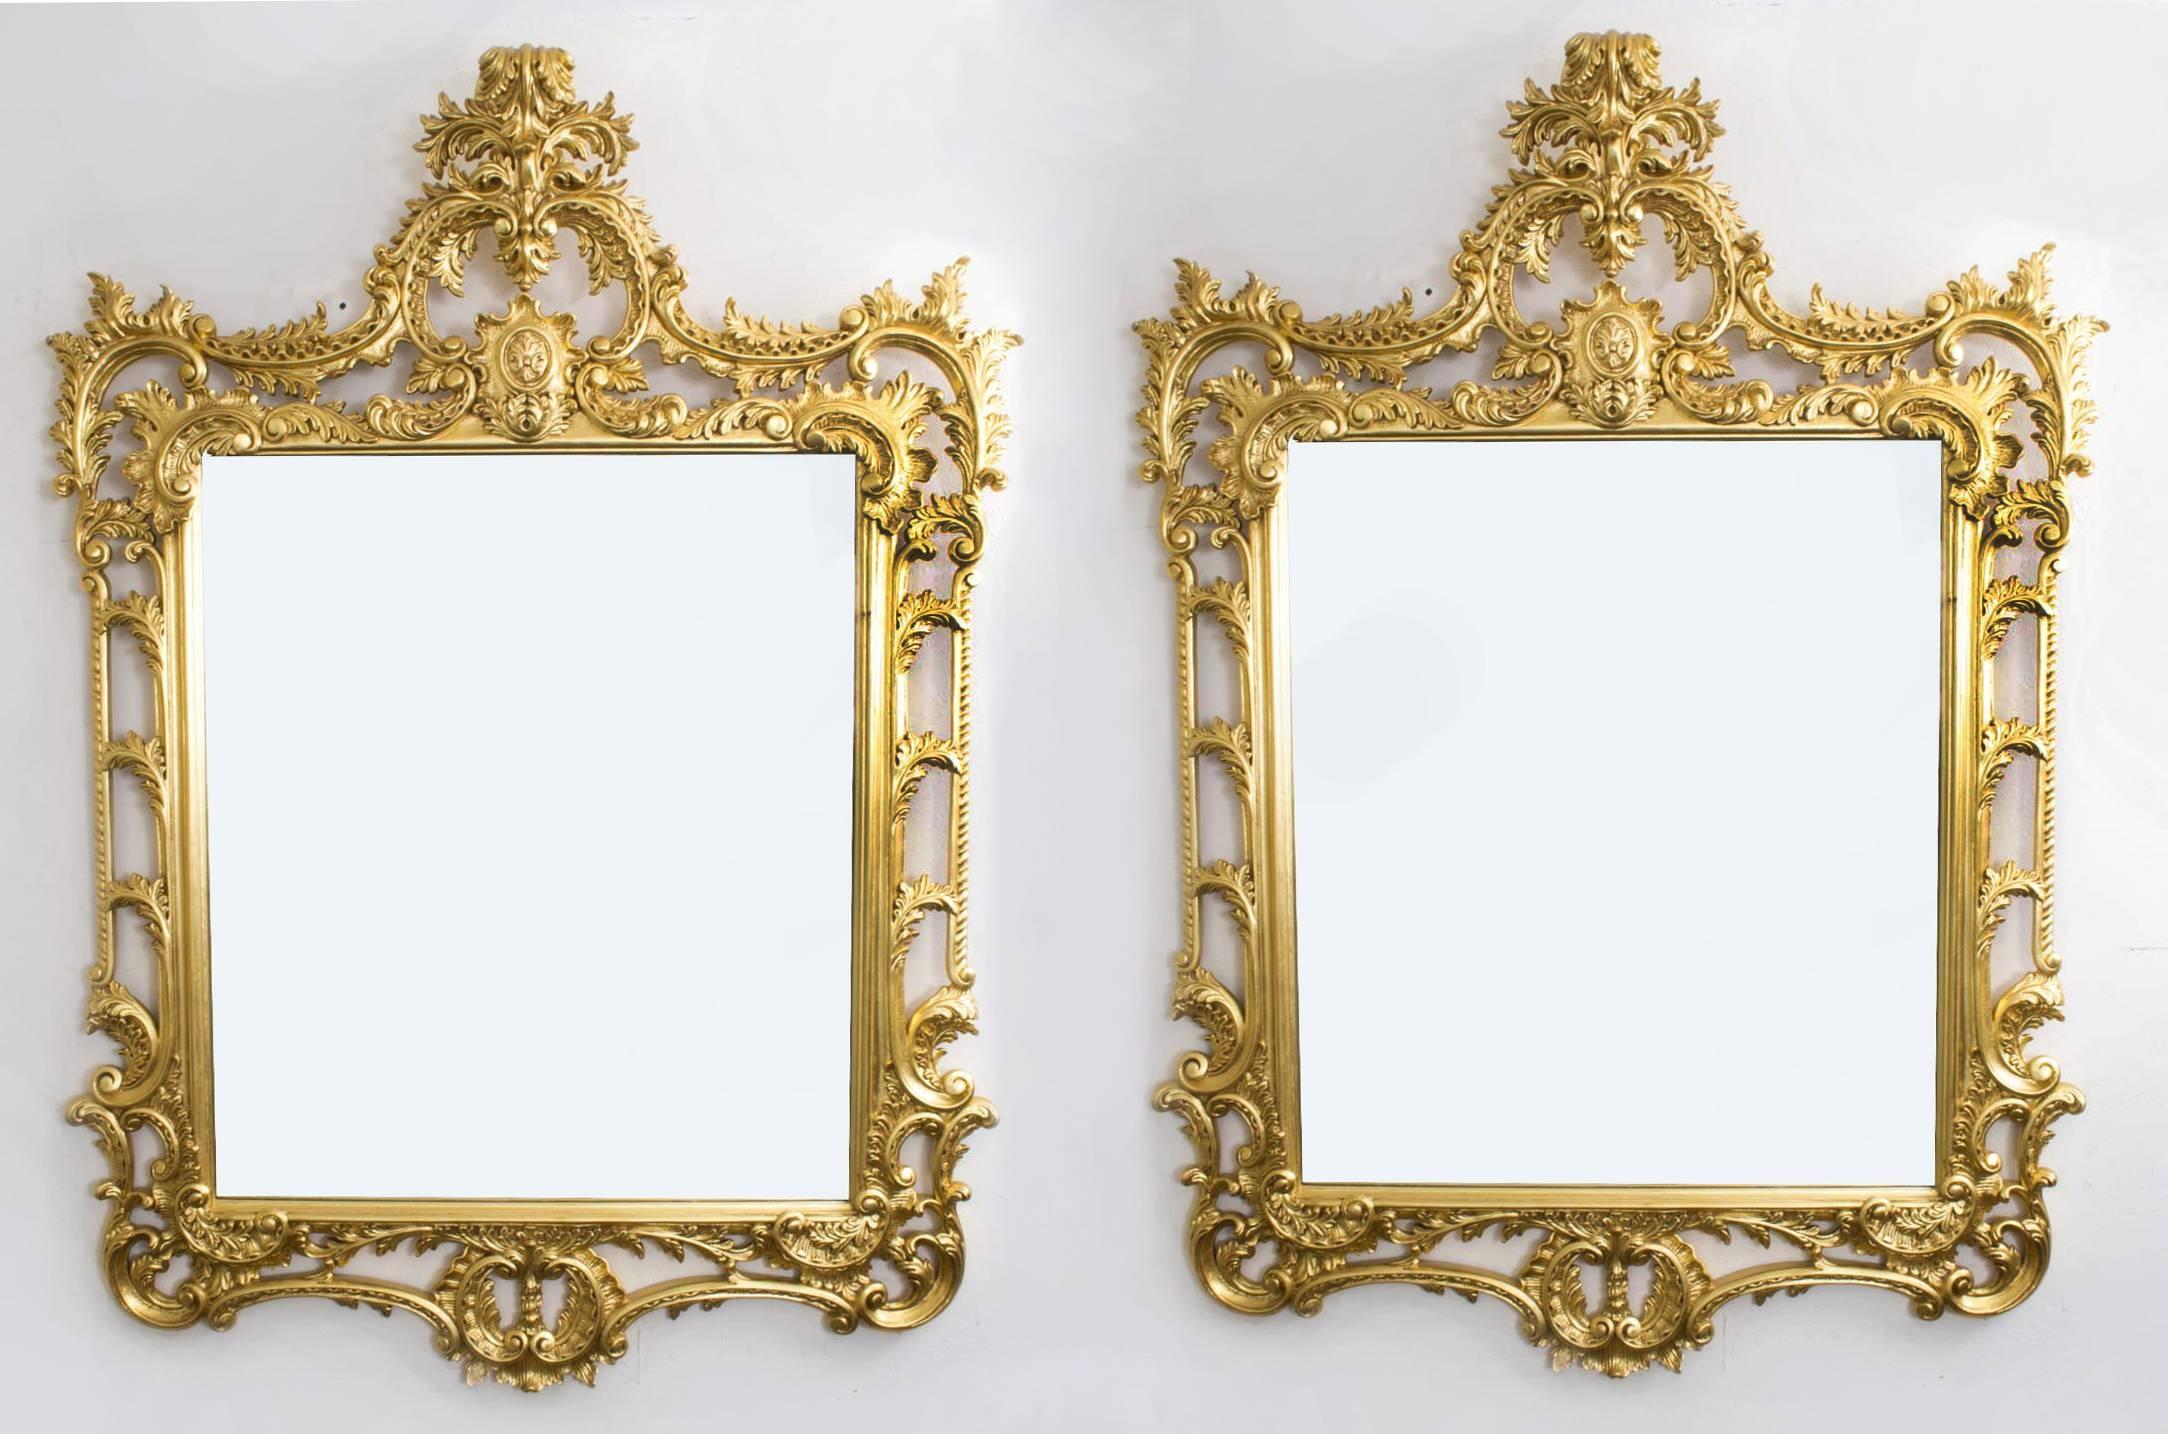 Pair Elaborate Gilded Hand Carved George Ii Style Mirrors | Vinterior regarding Elaborate Mirrors (Image 15 of 15)